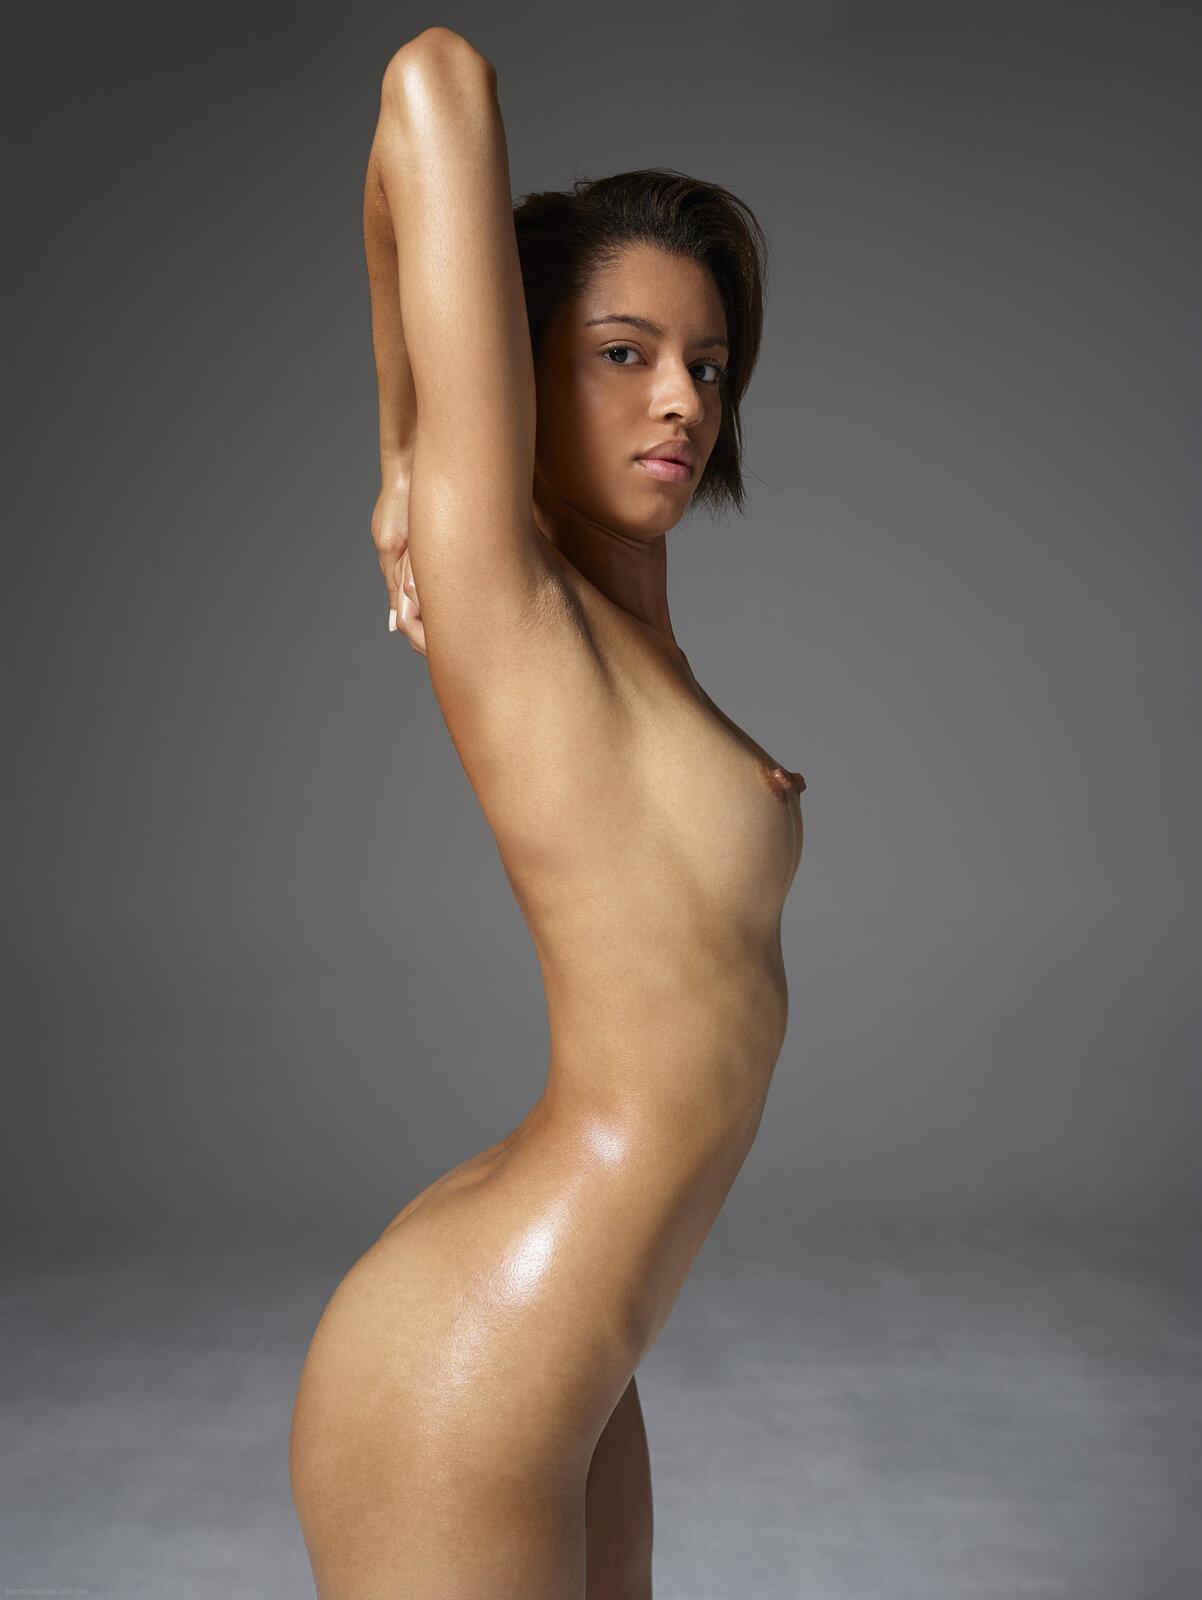 nude fantasy art tumblr